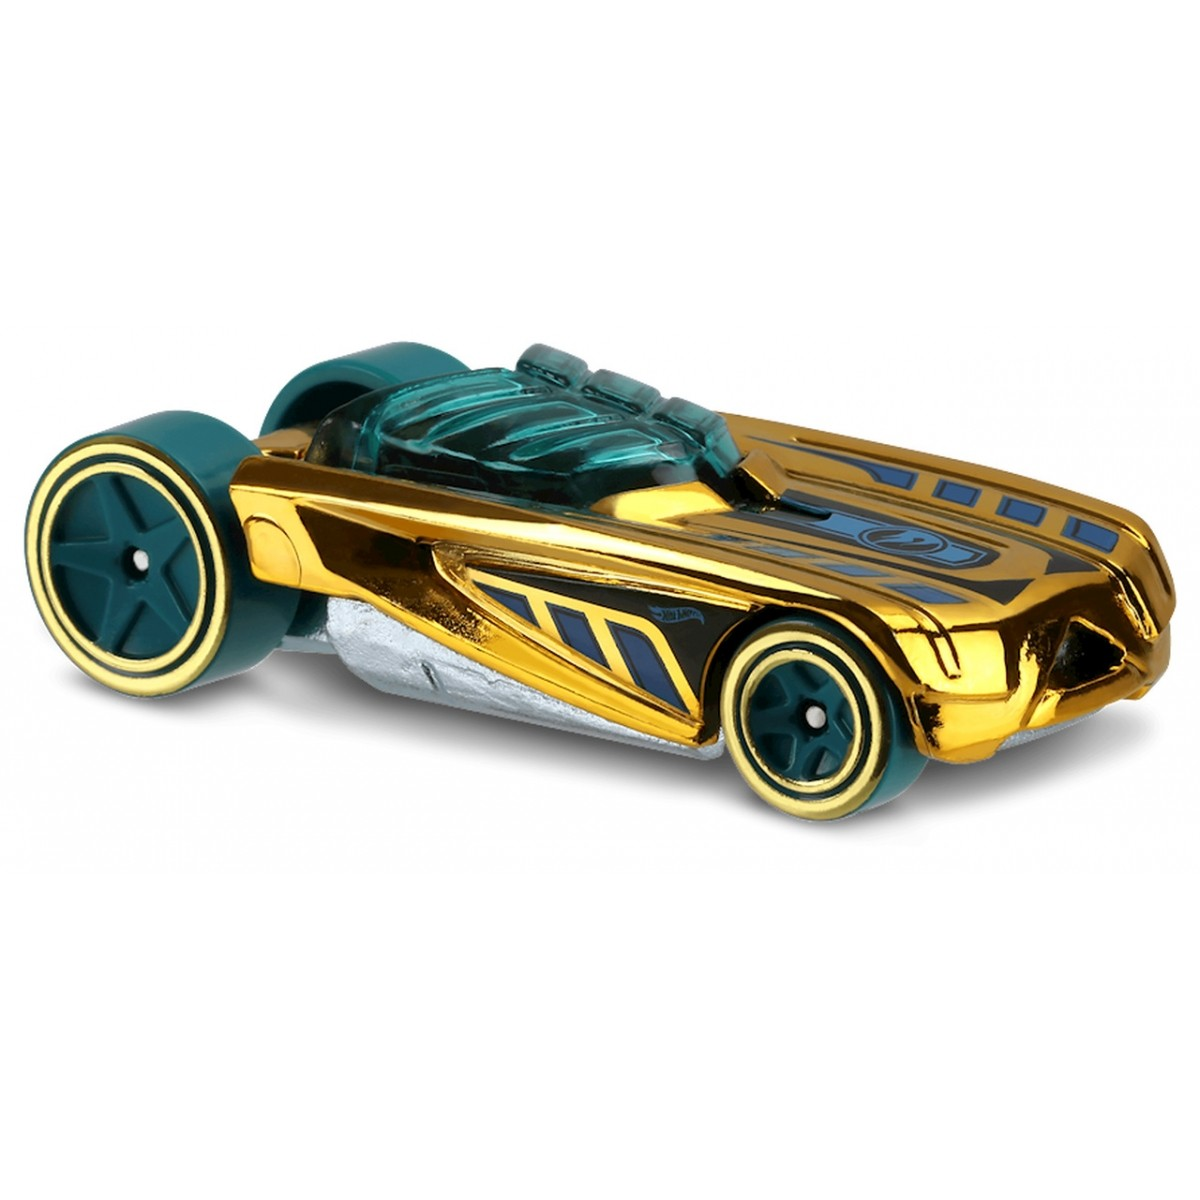 Carrinho Hot Wheels: Pharodox Dourado